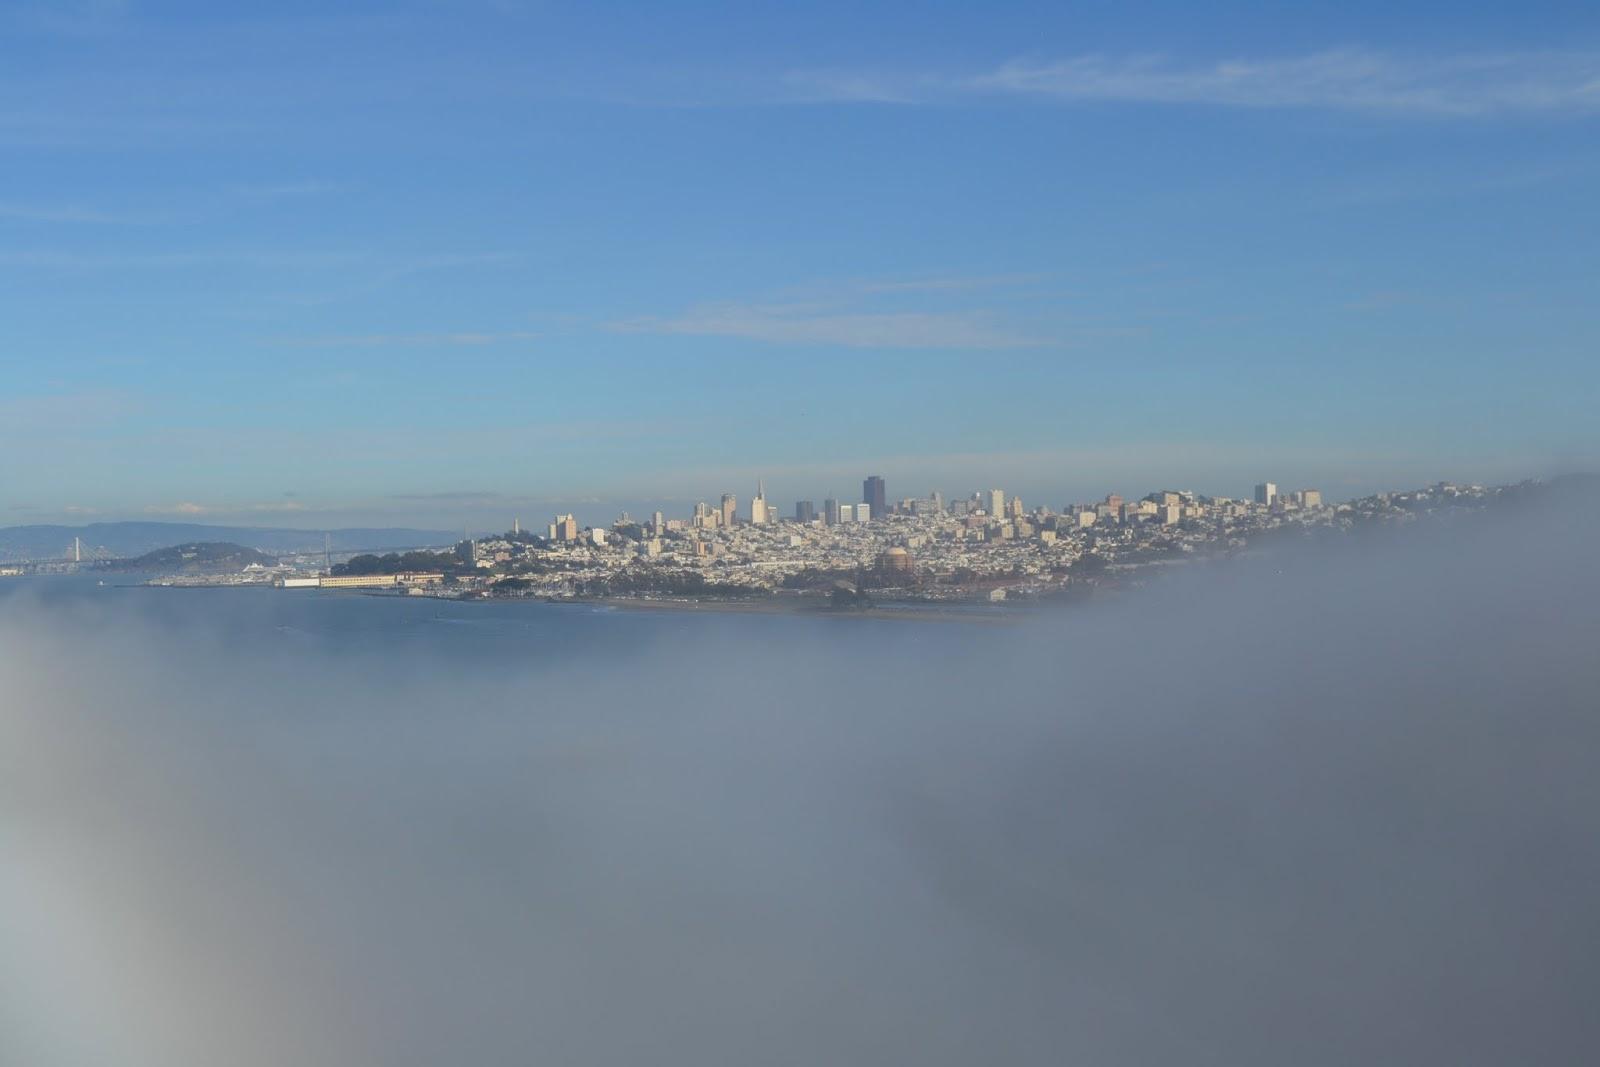 Сан-Франциско, Калифорния. (San Francisco, CA)